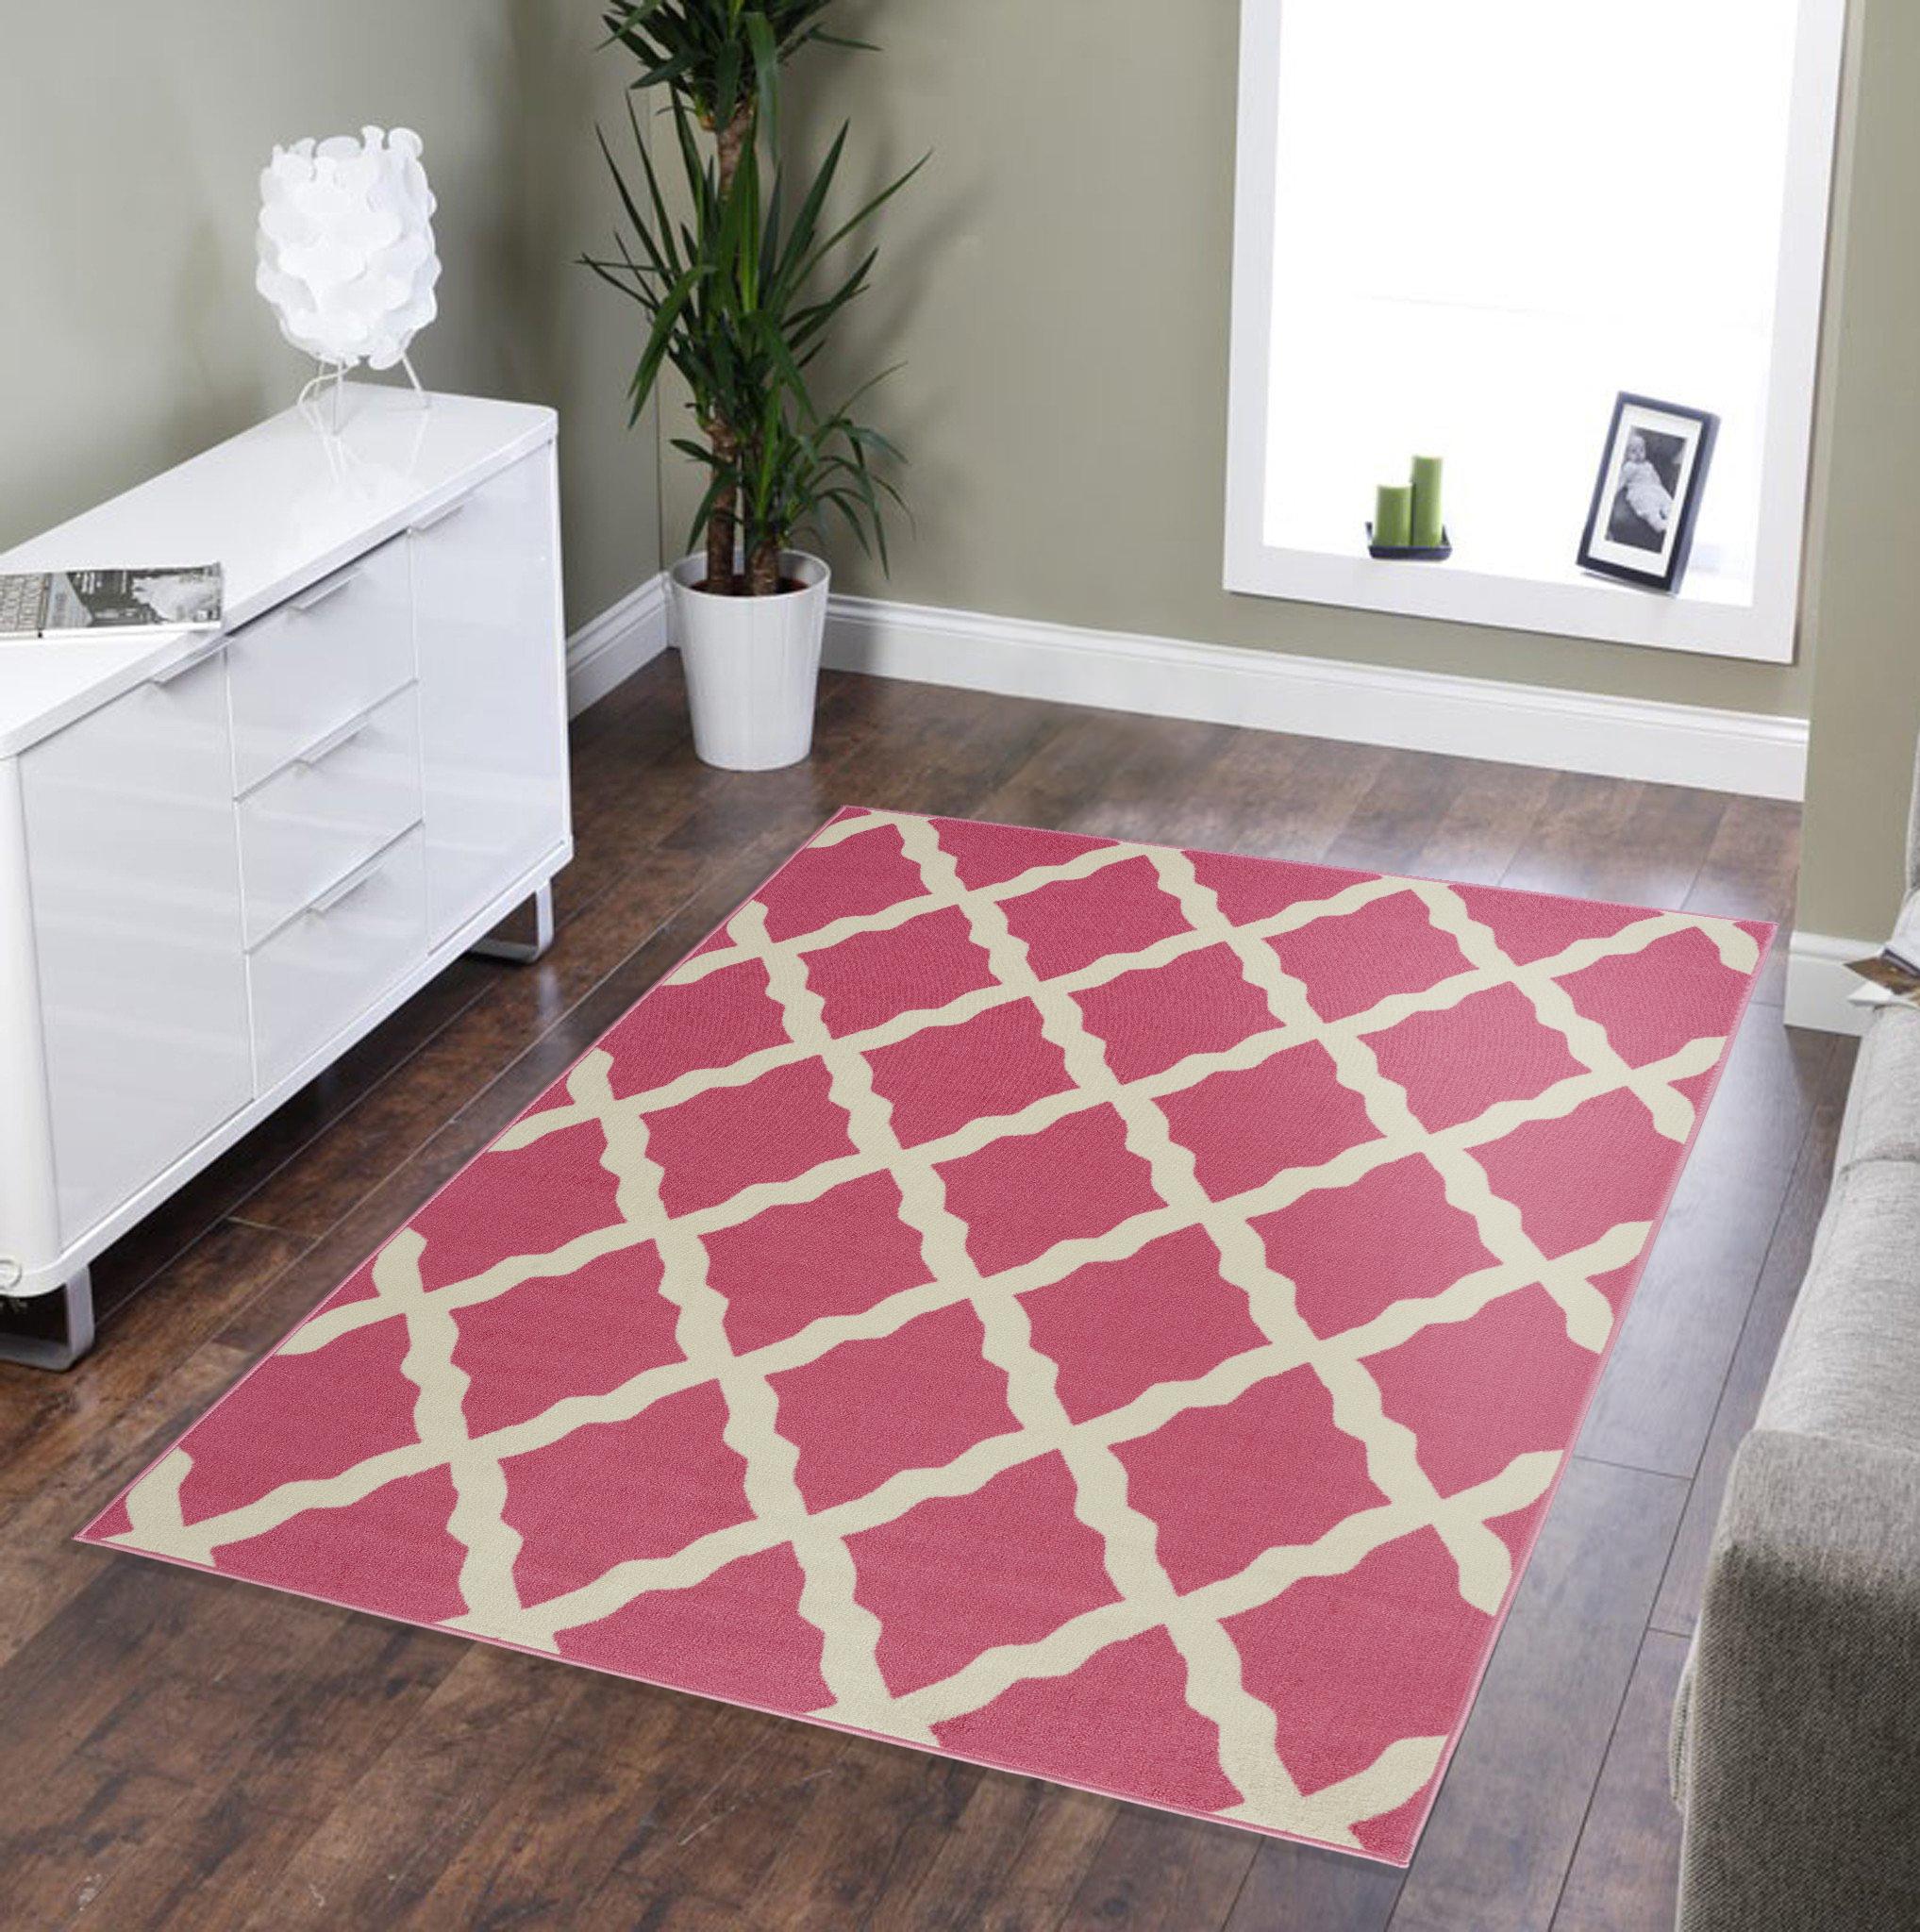 "5' x 6'6"" Ottomanson Glamour Collection Moroccan Geometric Trellis Area Rug: Dark Pink $27.80, Blue $32, Dark Grey $33.15 & More + F/S $35+"